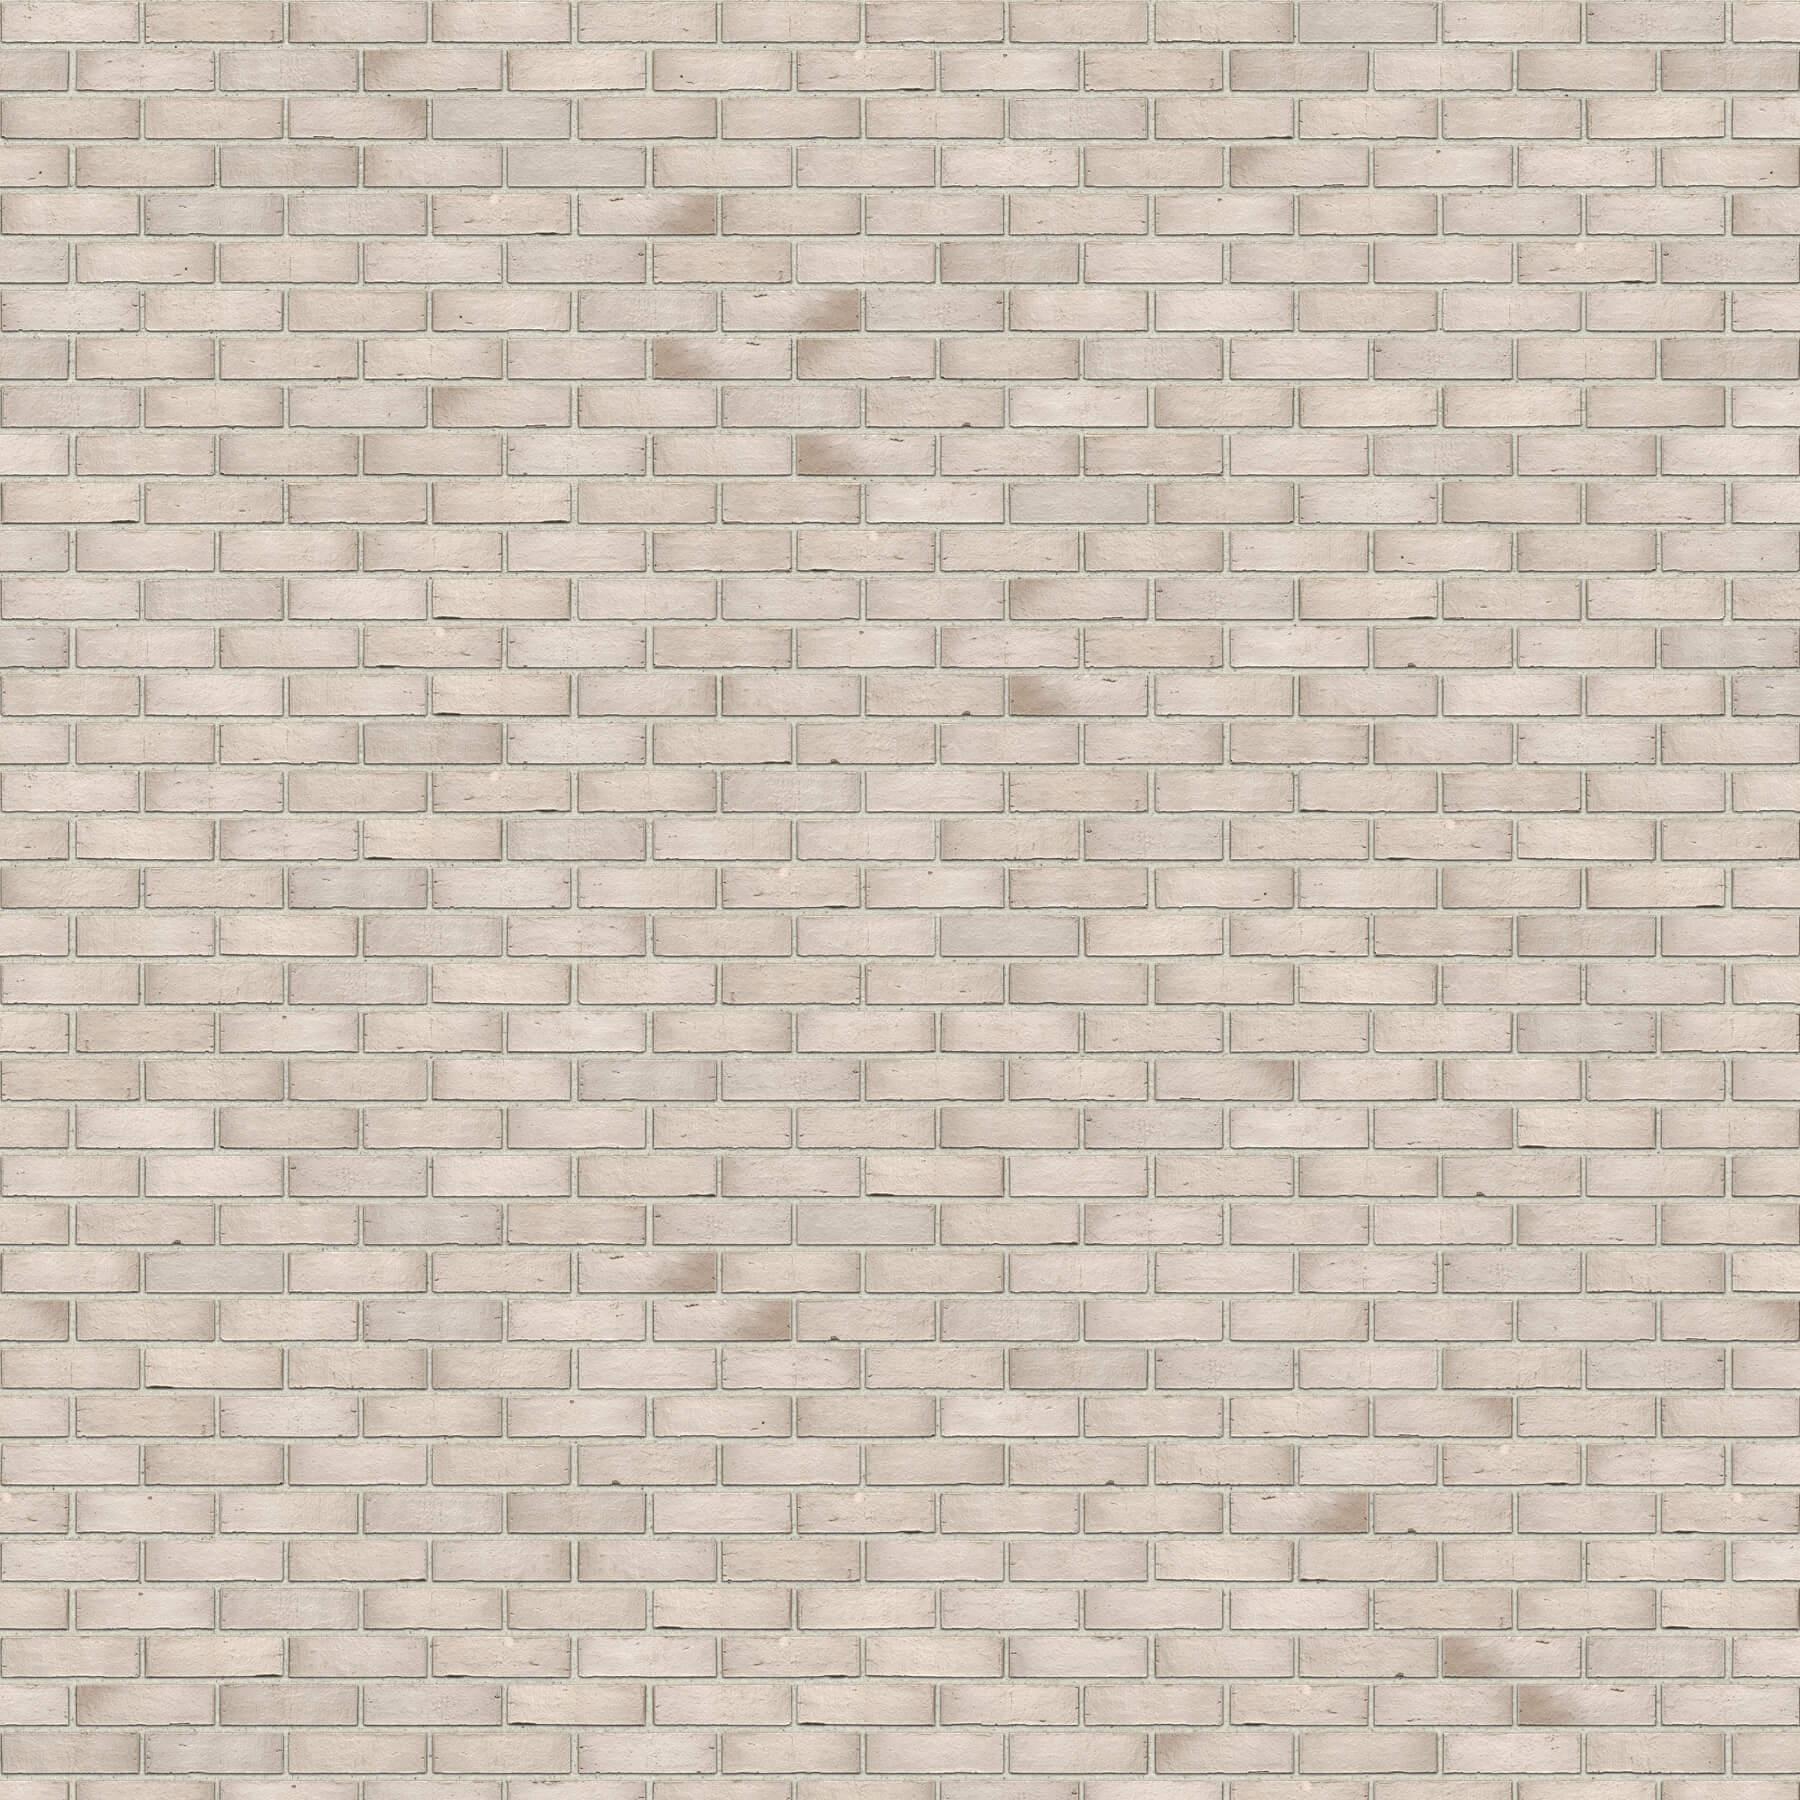 Dekorativna cigla listela FeldHaus Klinker r-941 nf Bela Fuga